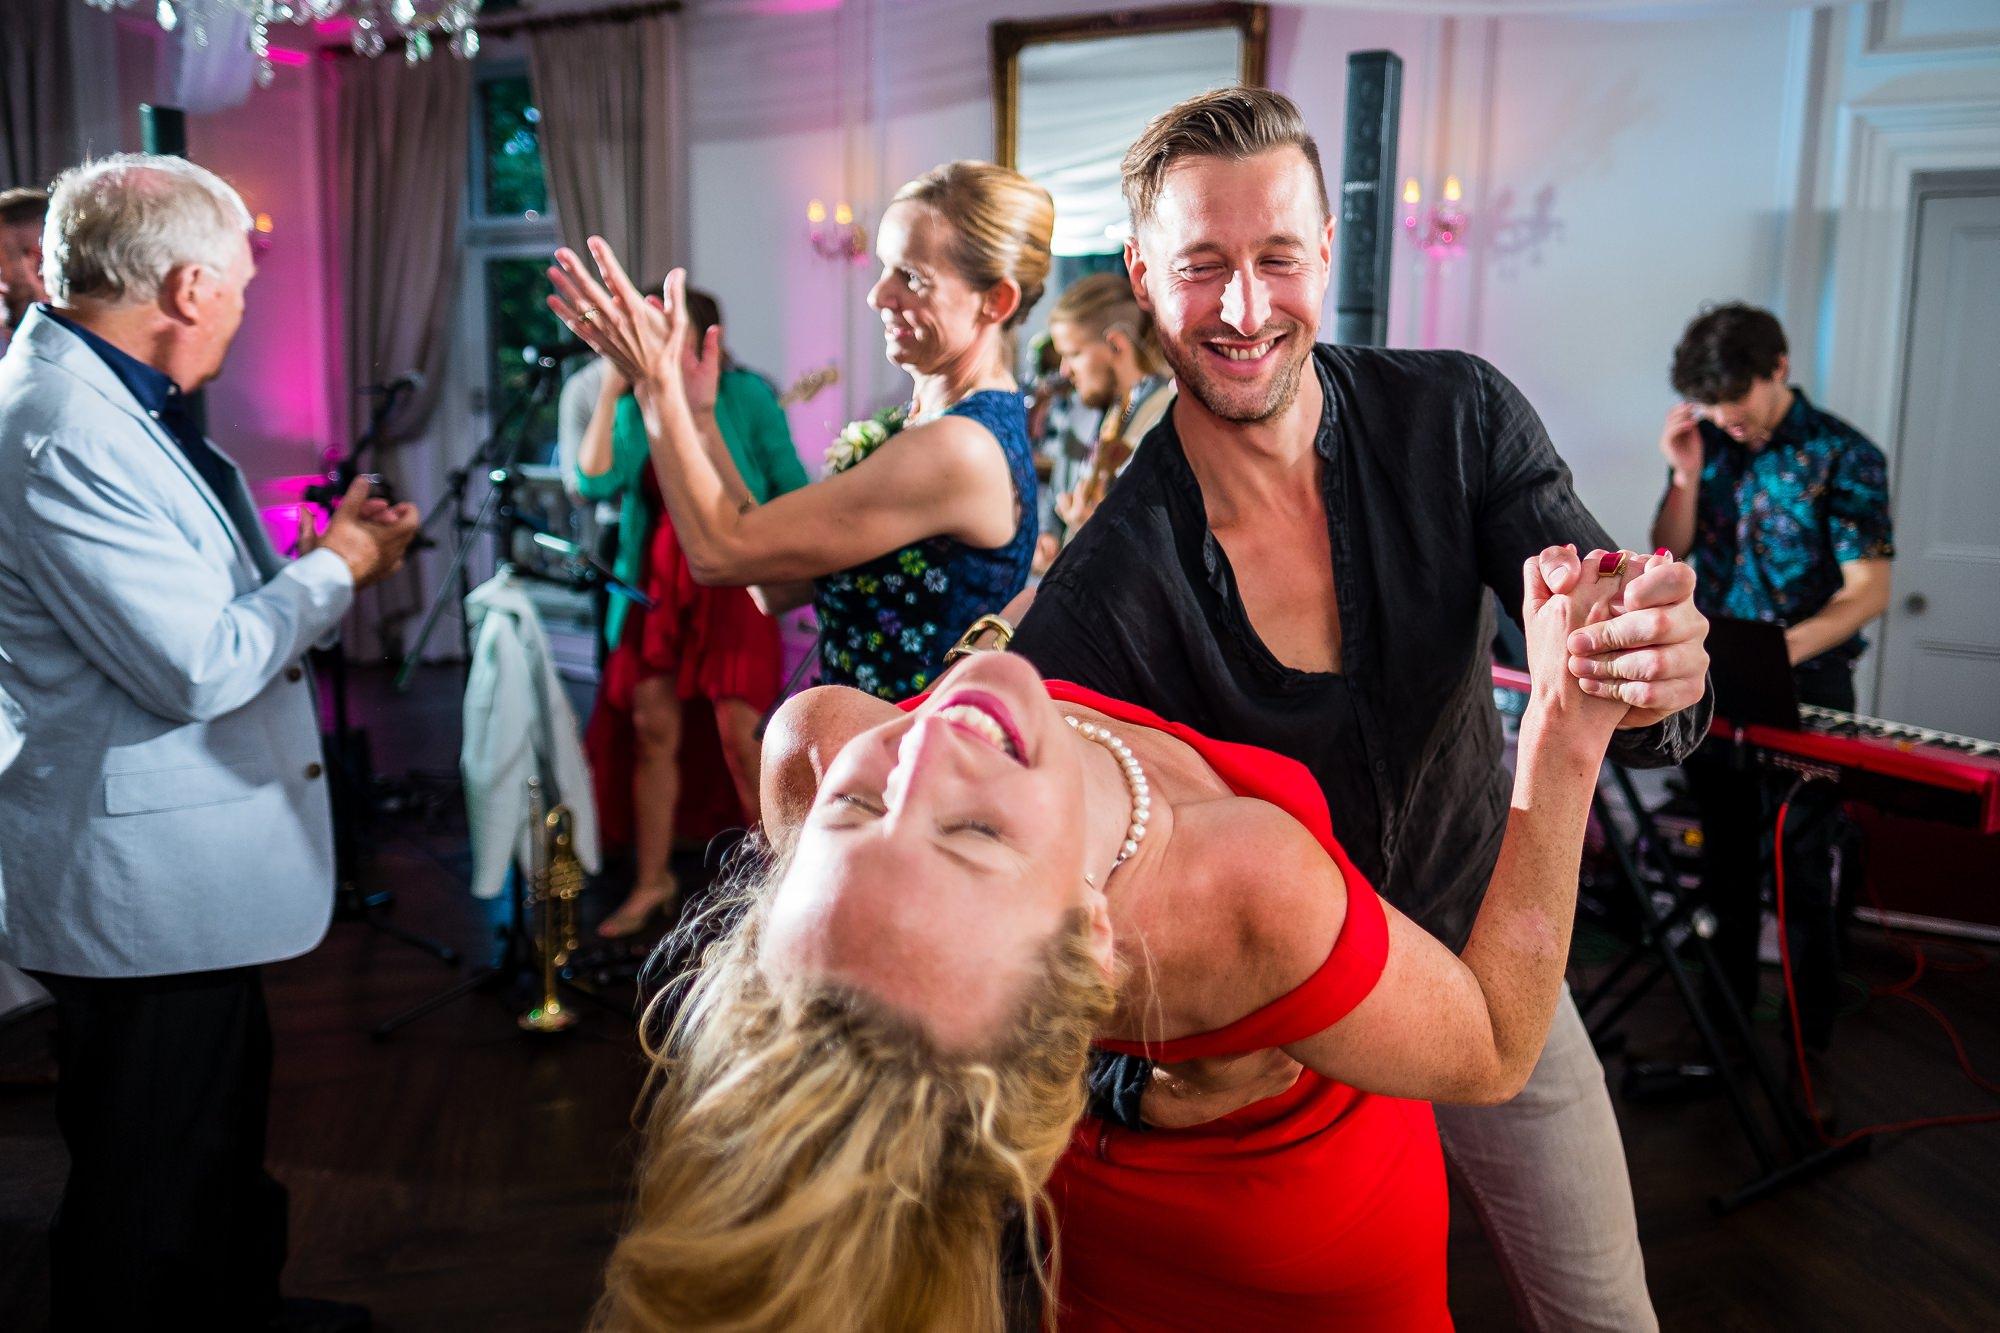 wedding guests doing crazy dance